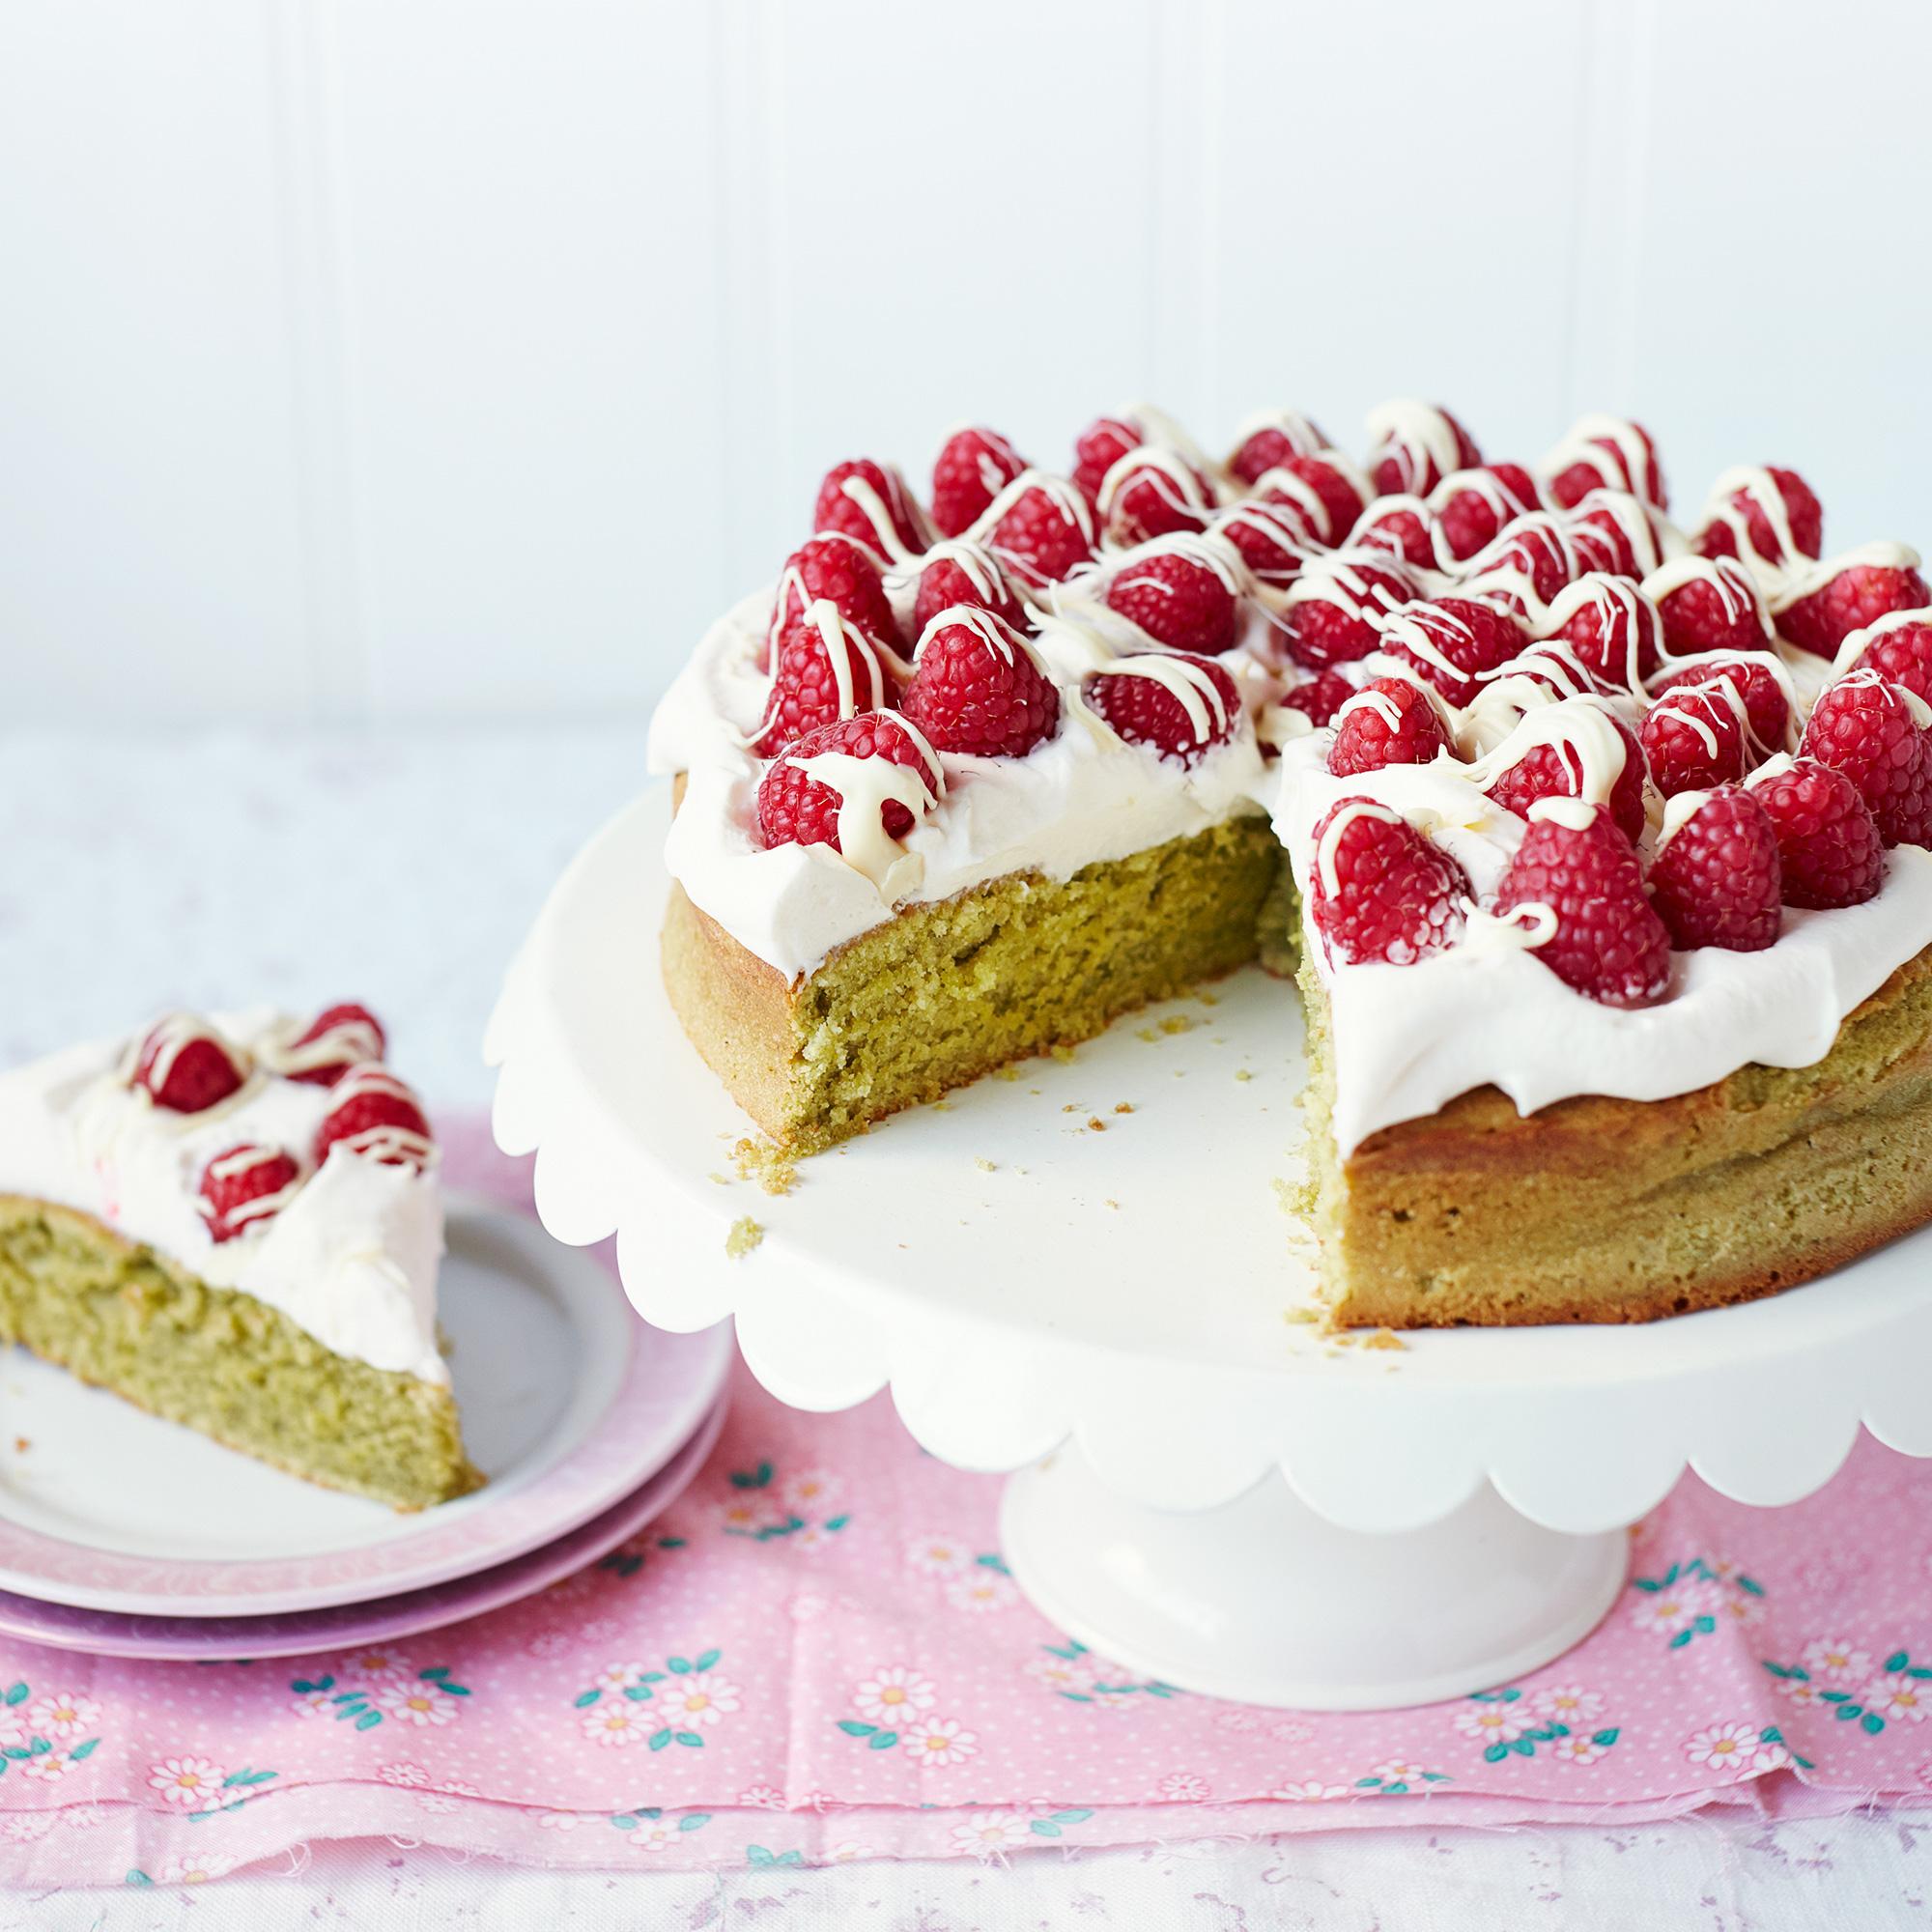 Matcha Cake With Raspberries And White Chocolate Dessert Recipes Woman Home